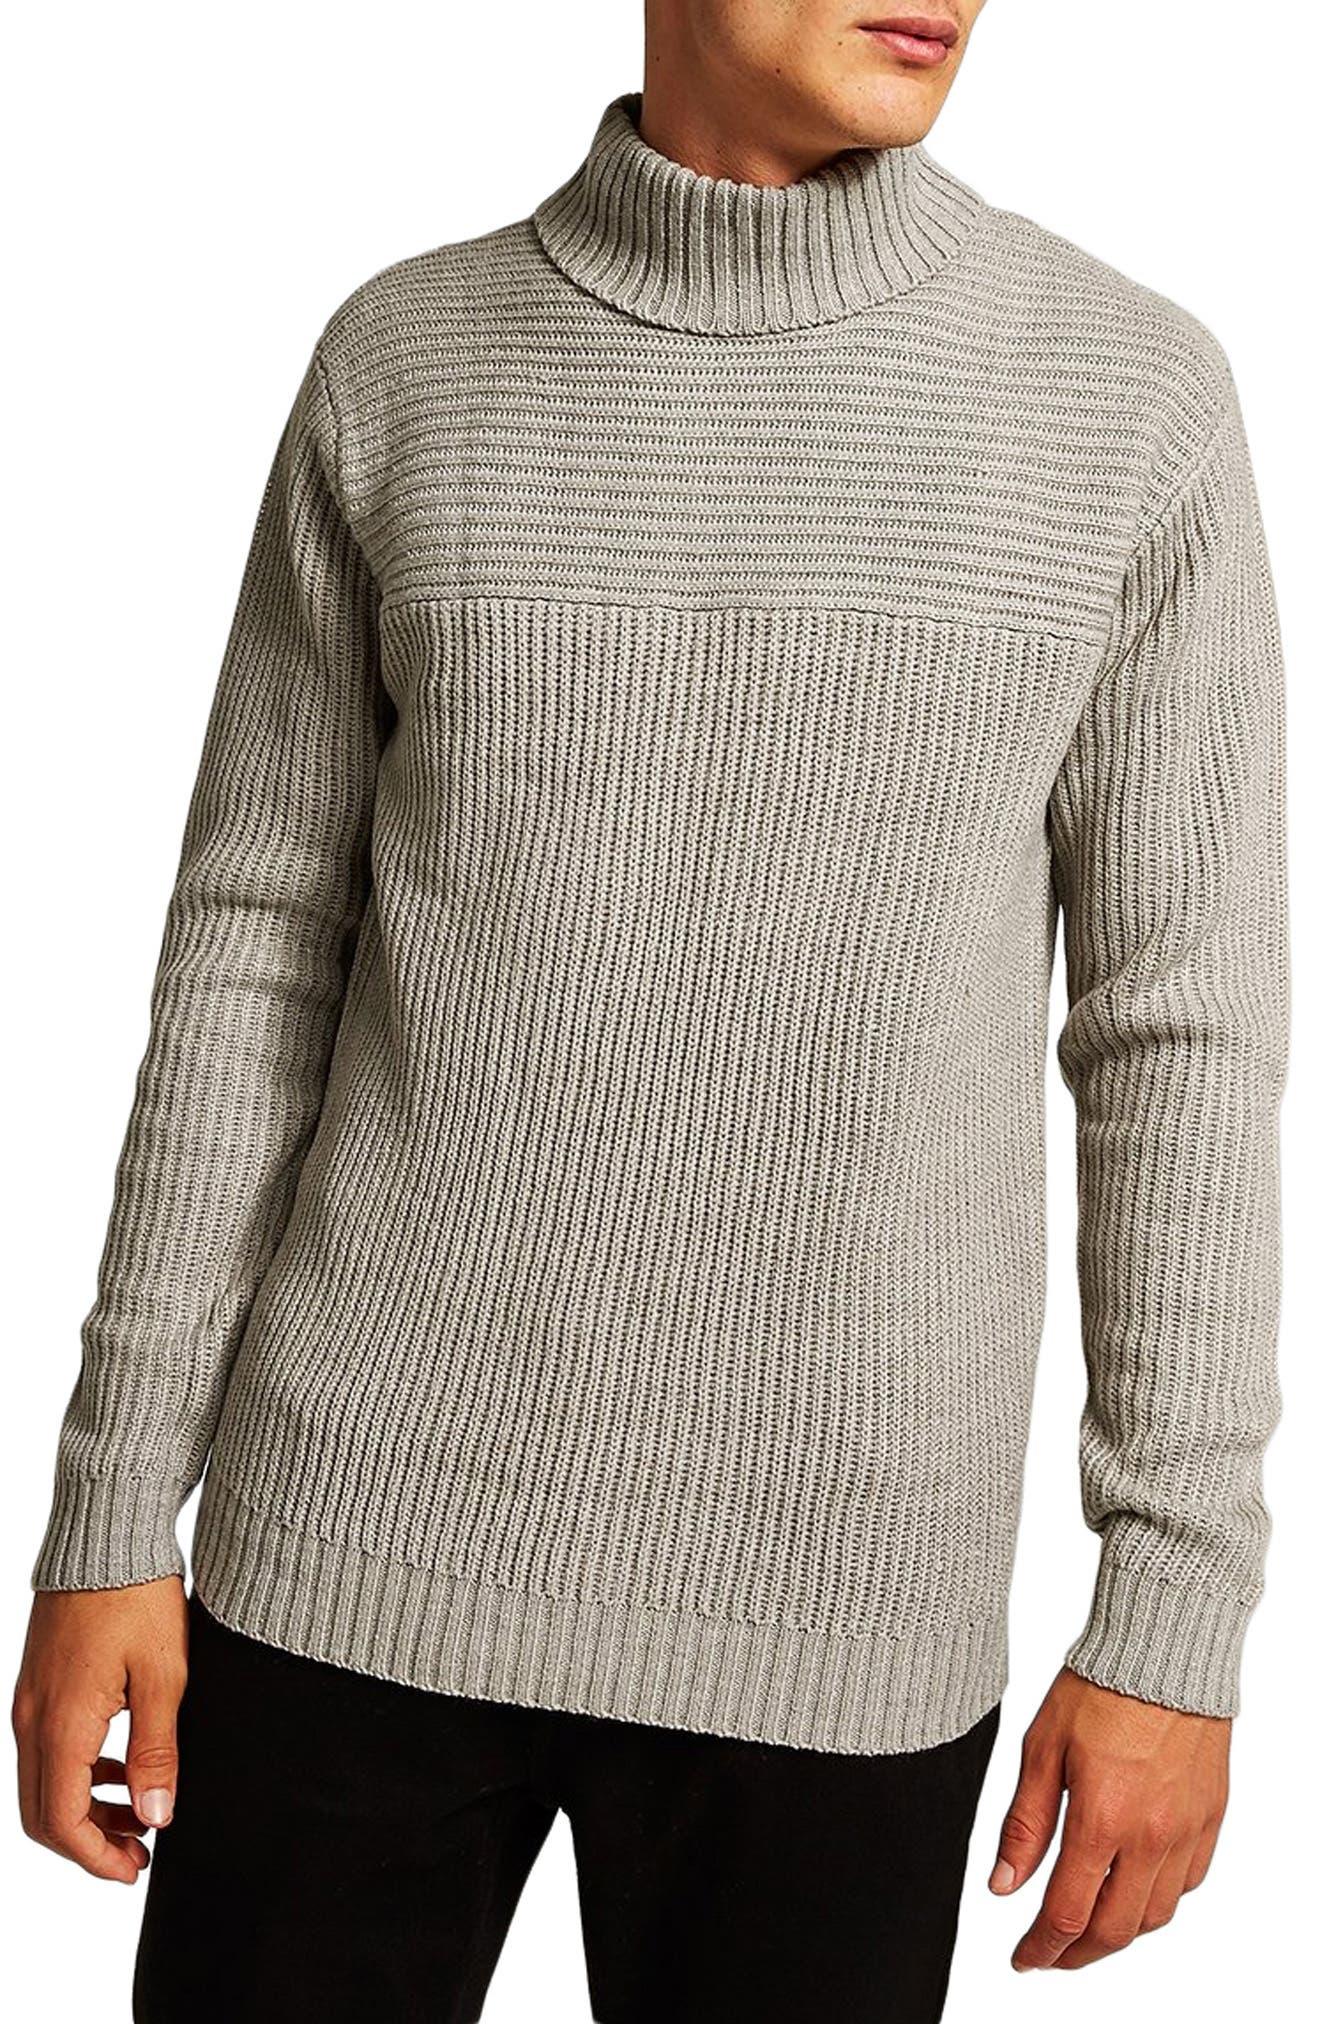 Flint Ribbed Turtleneck Sweater,                             Main thumbnail 1, color,                             020